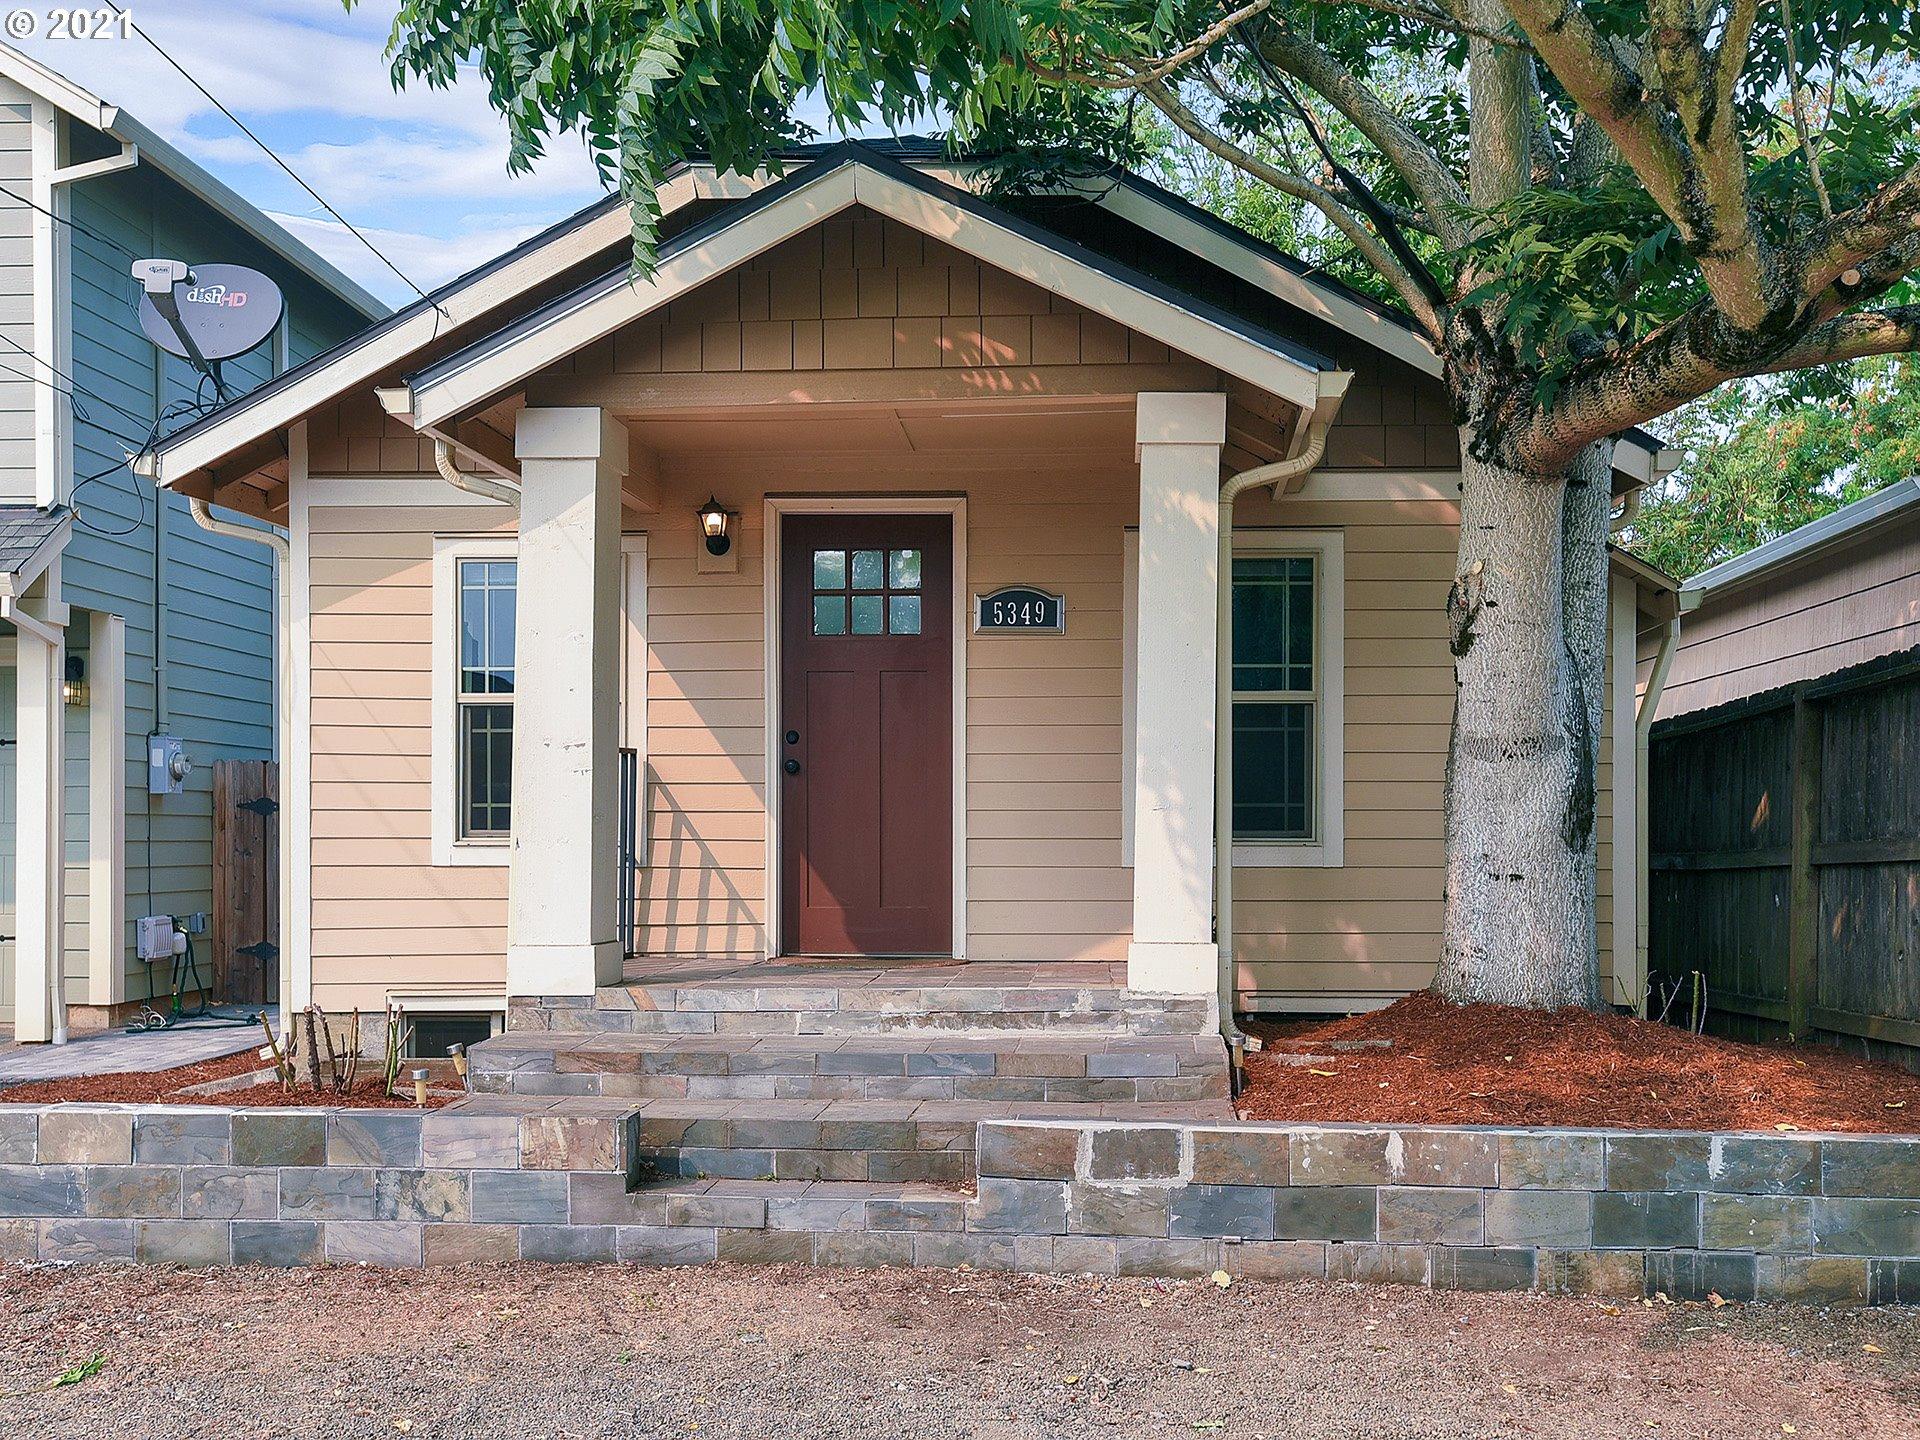 5349 SE LAMBERT ST, Portland OR 97206